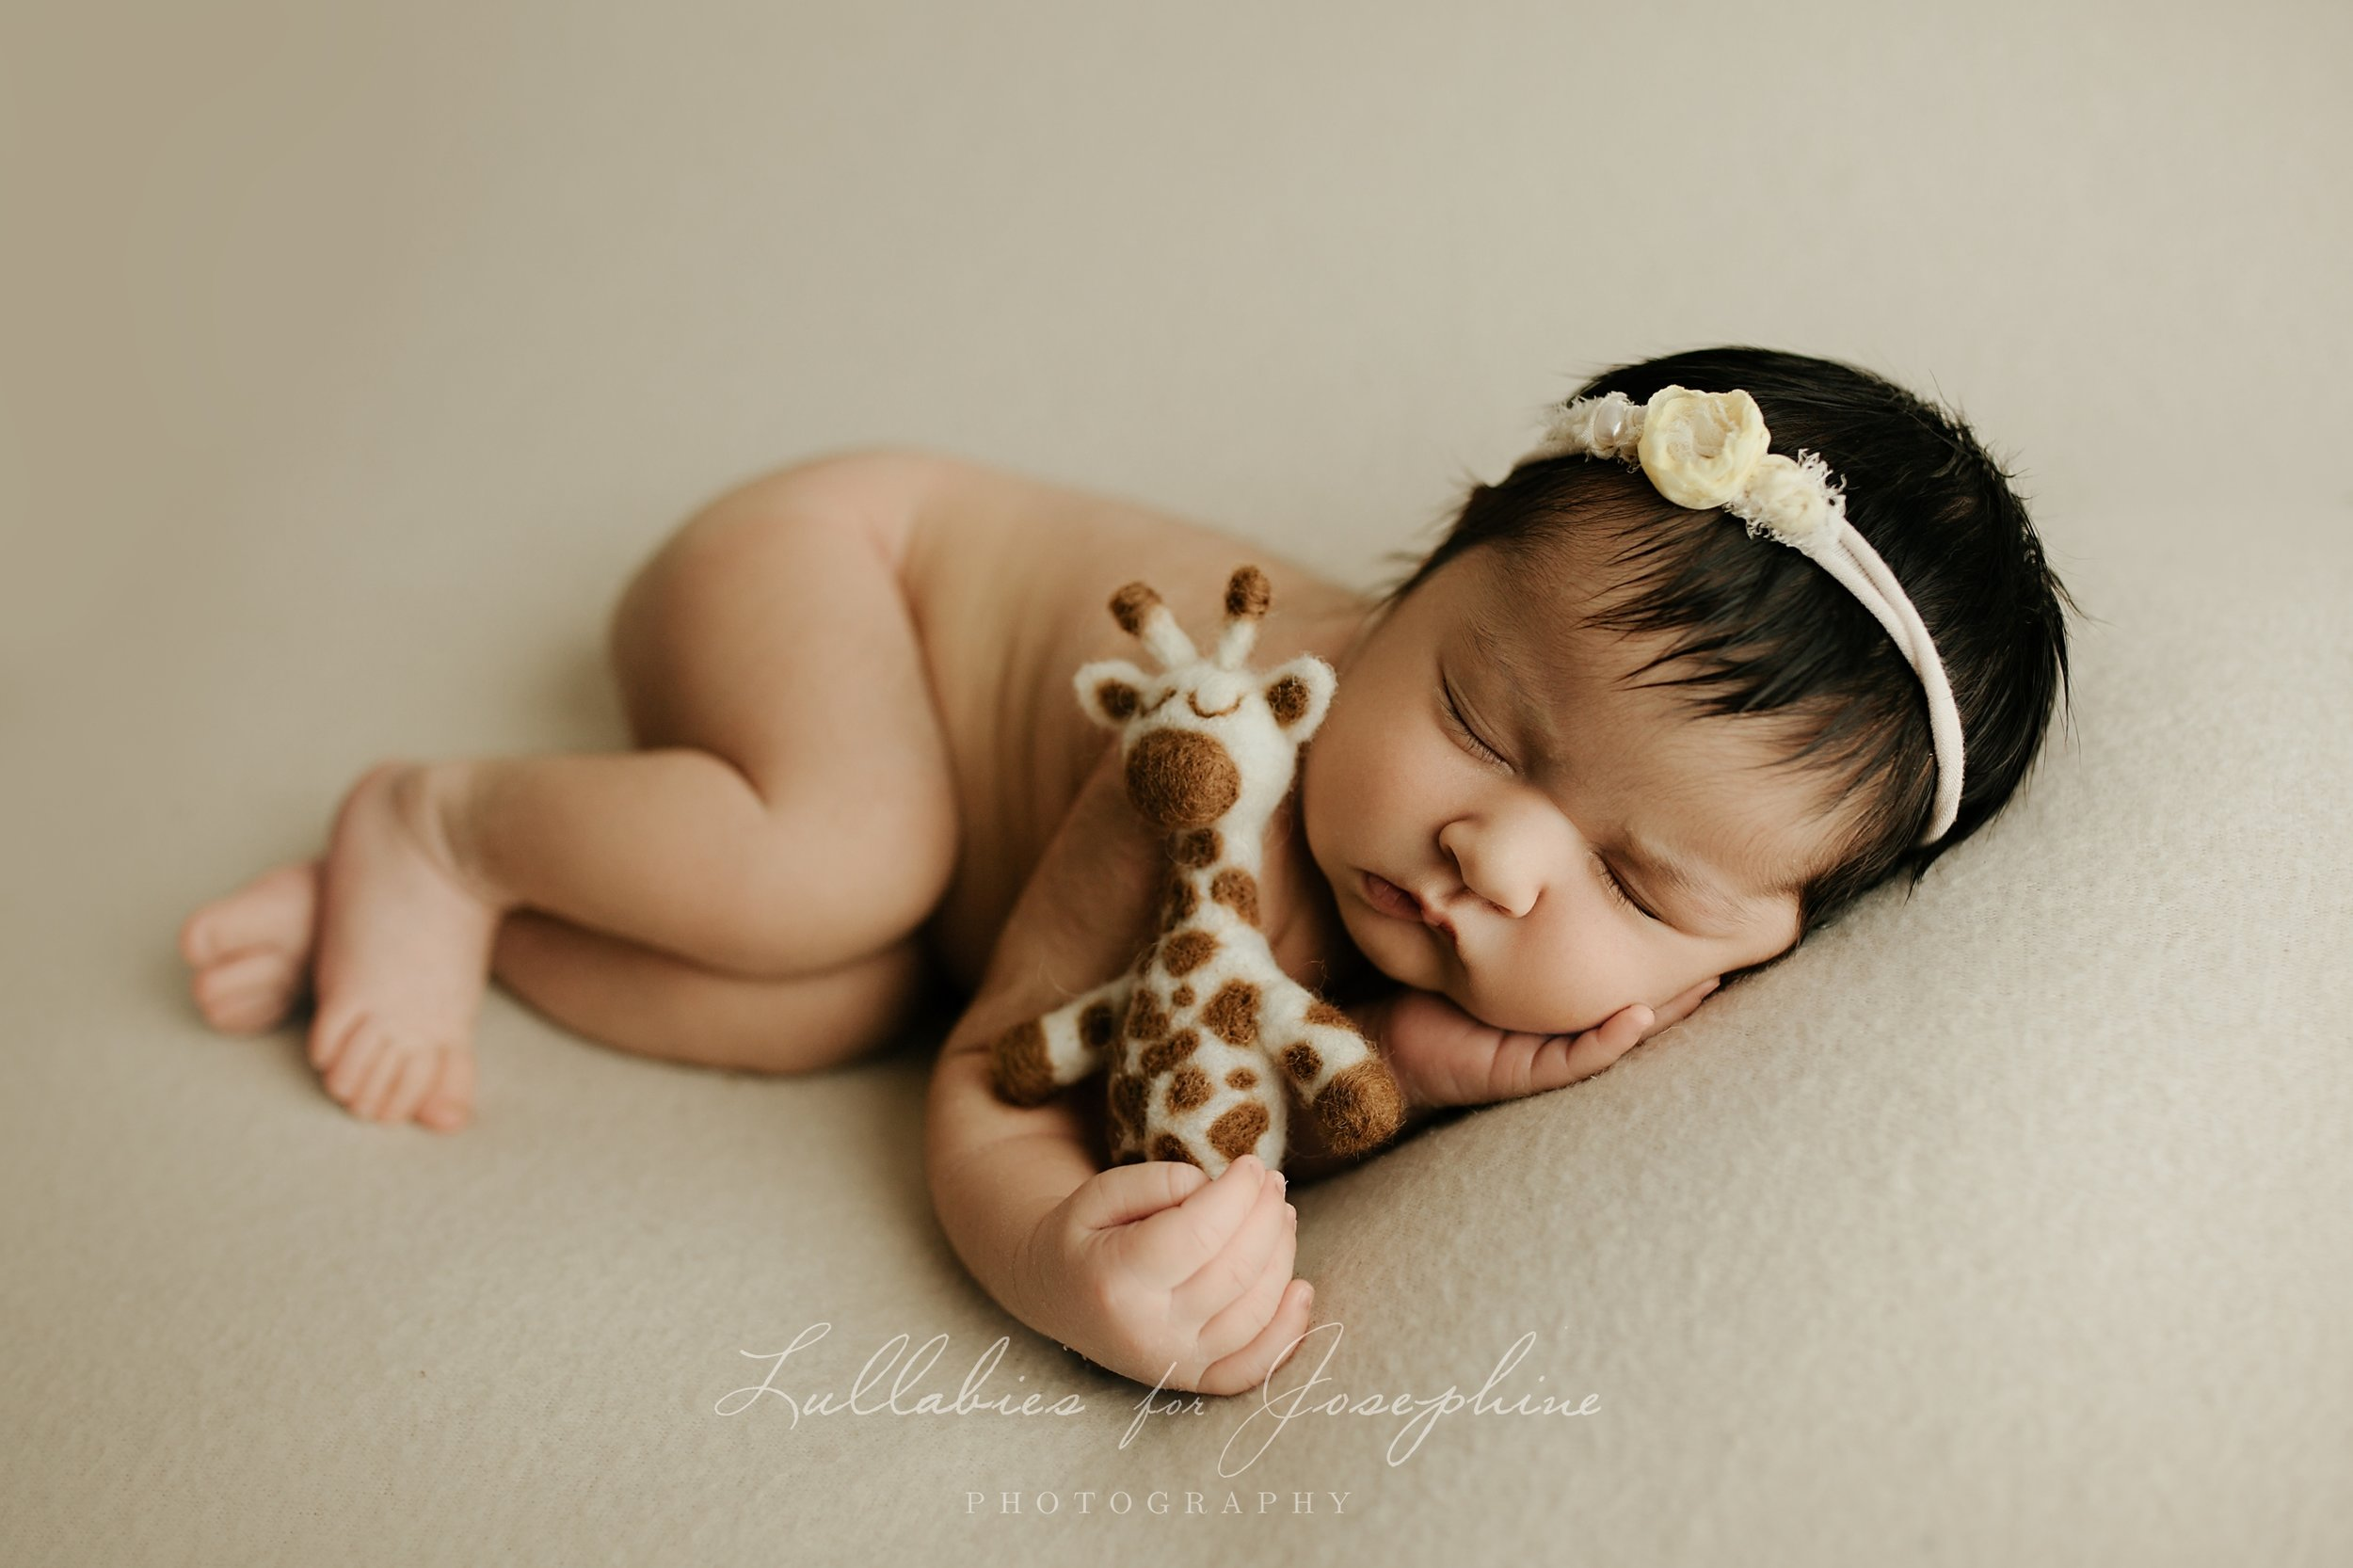 NJ-newborn-photographer-baby-sleeping-giraffe-headband